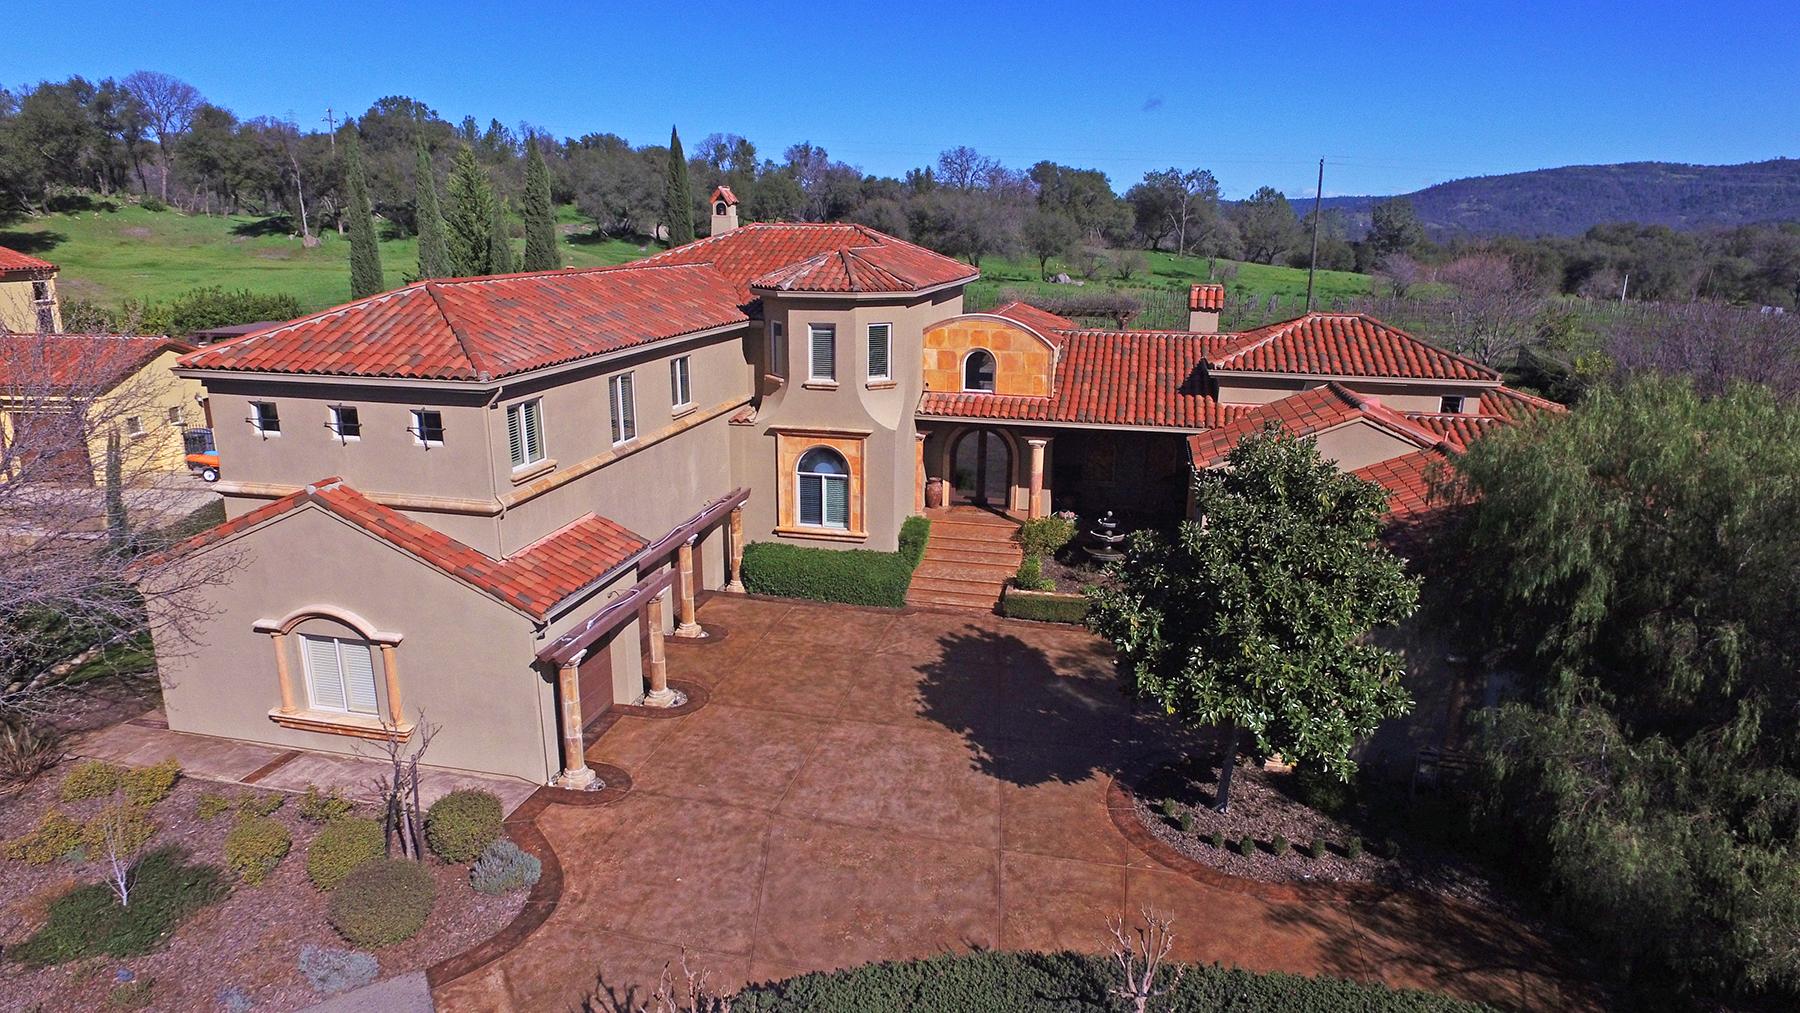 Single Family Home for Sale at 9732 Clos Du Lac Circle, Loomis, CA 95650 Loomis, California, 95650 United States